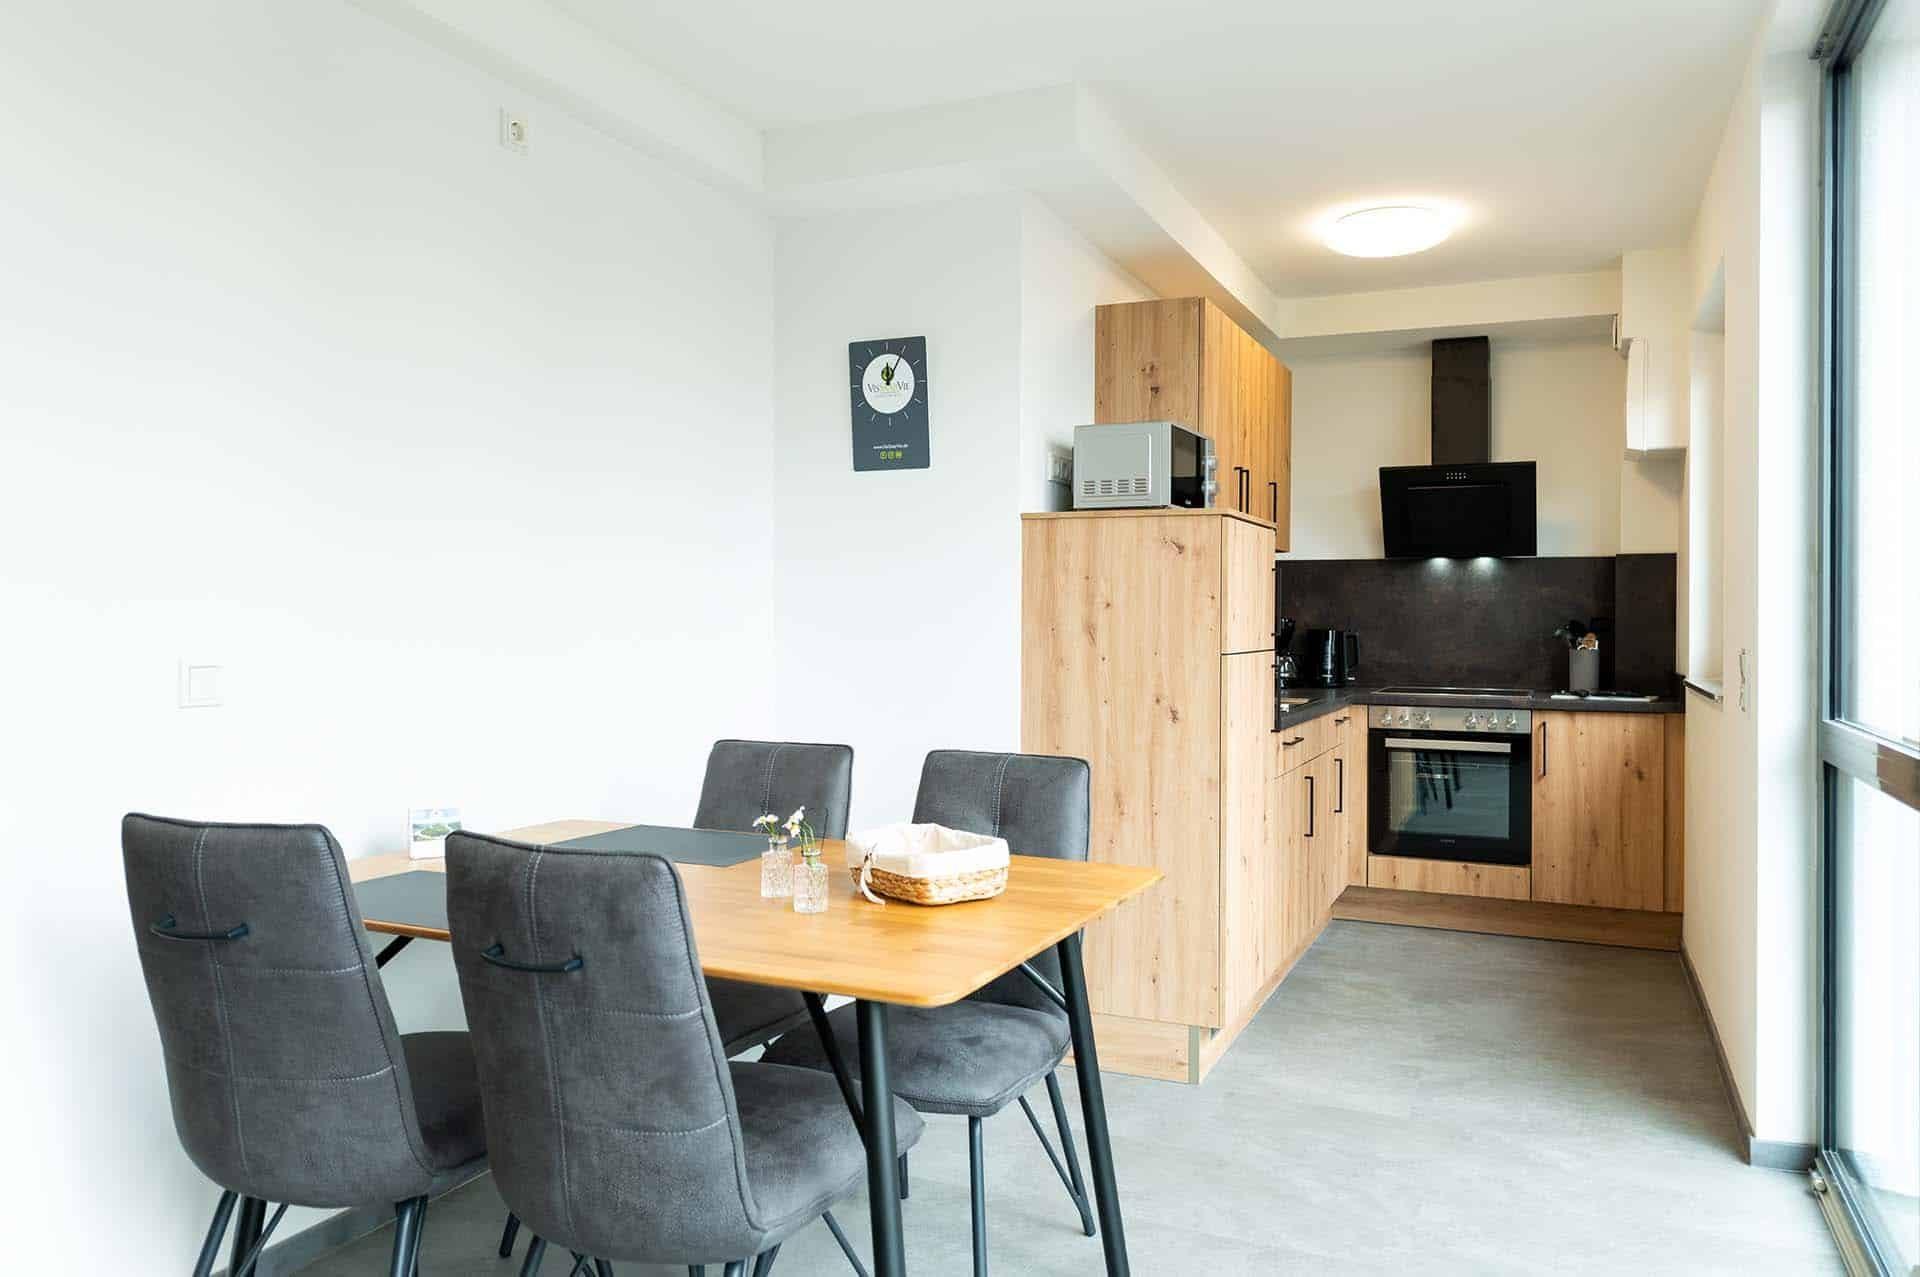 appartement-freudenburg-seszimmer-kueche